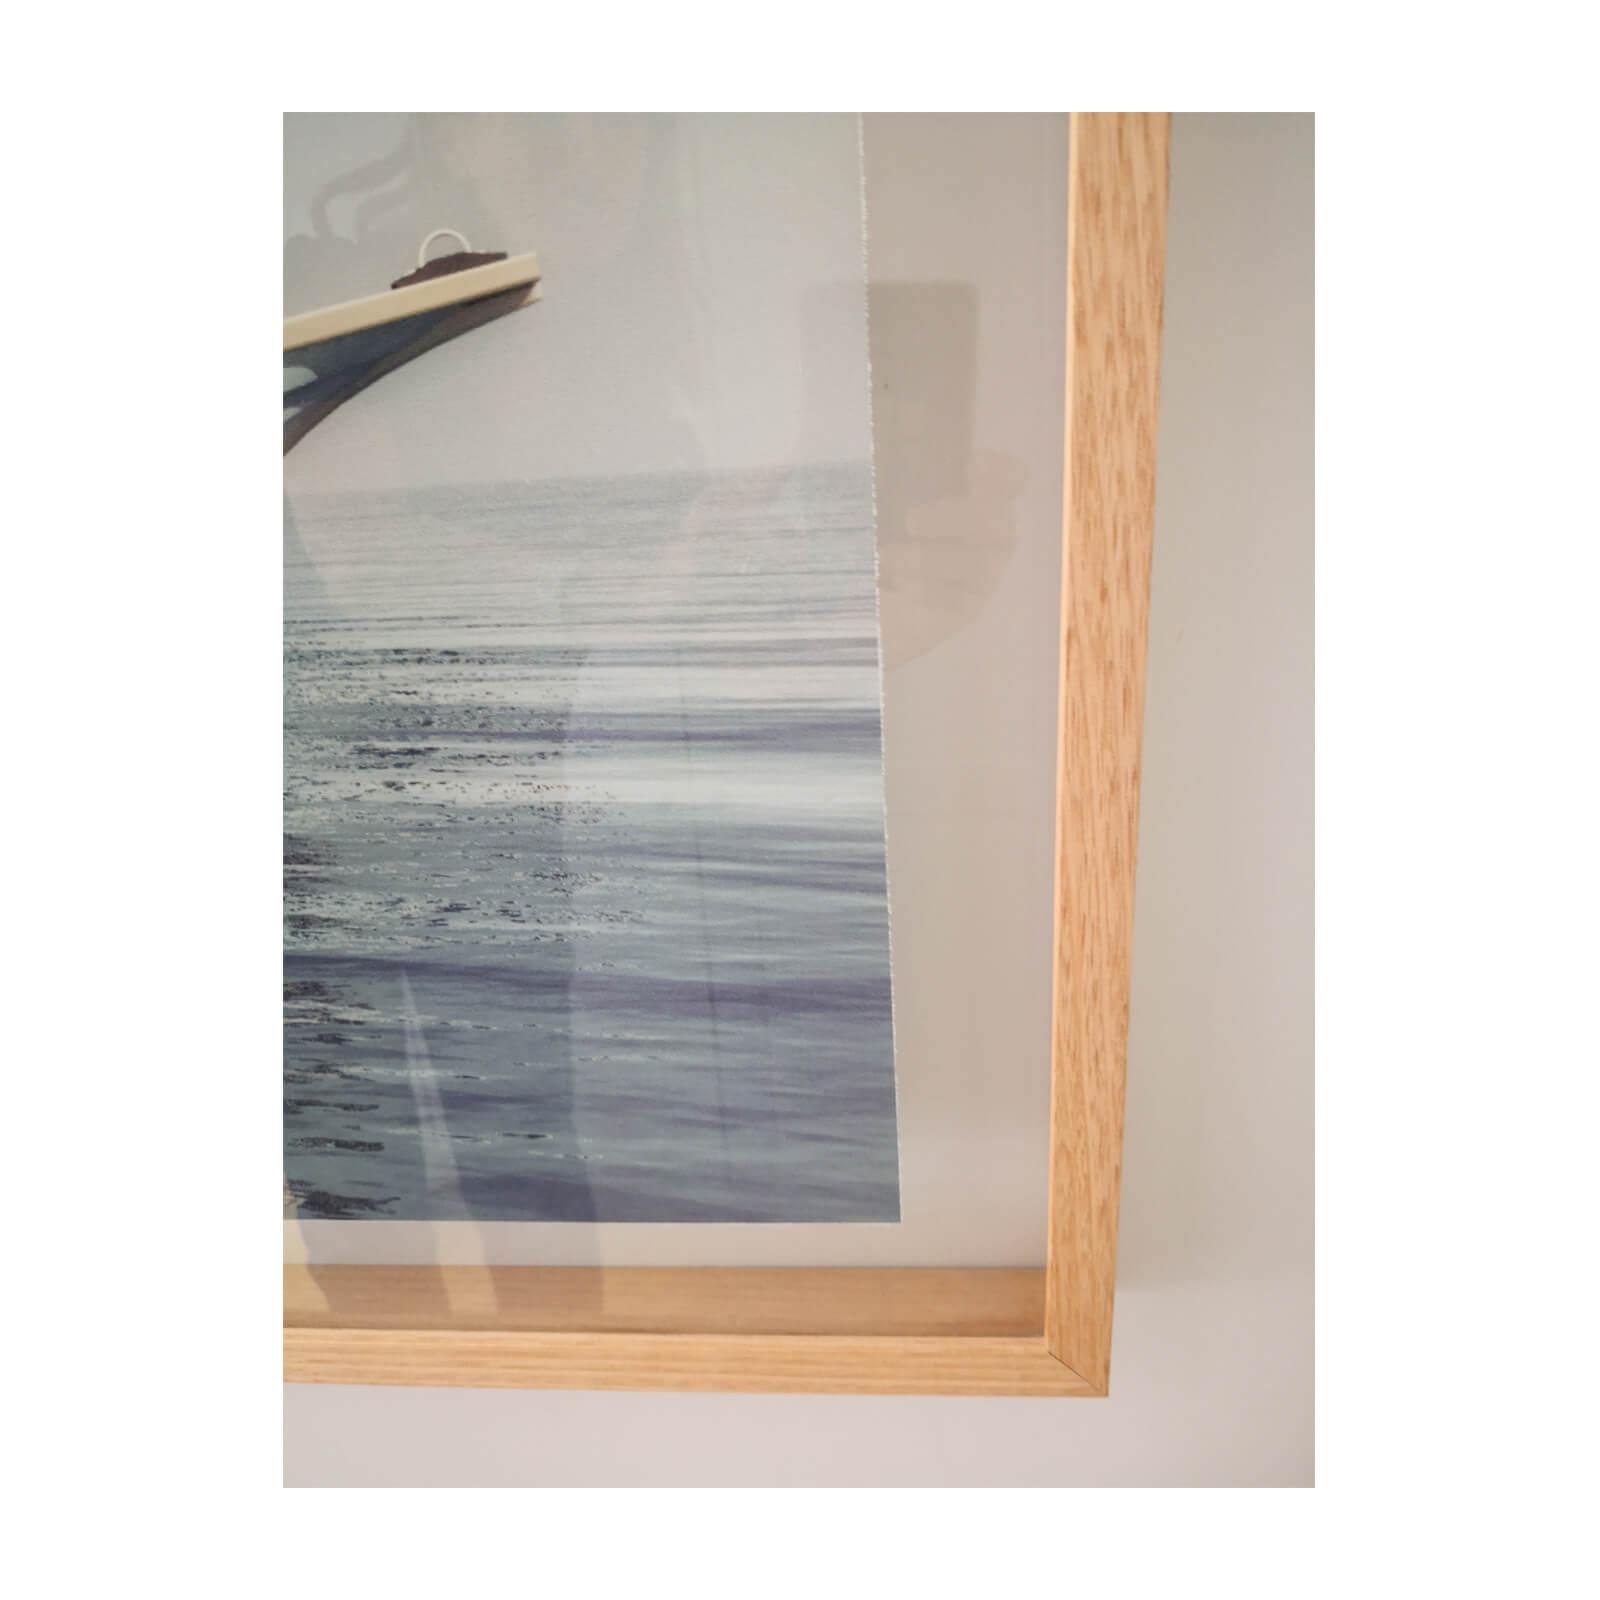 framed-photomontage prints safari animals